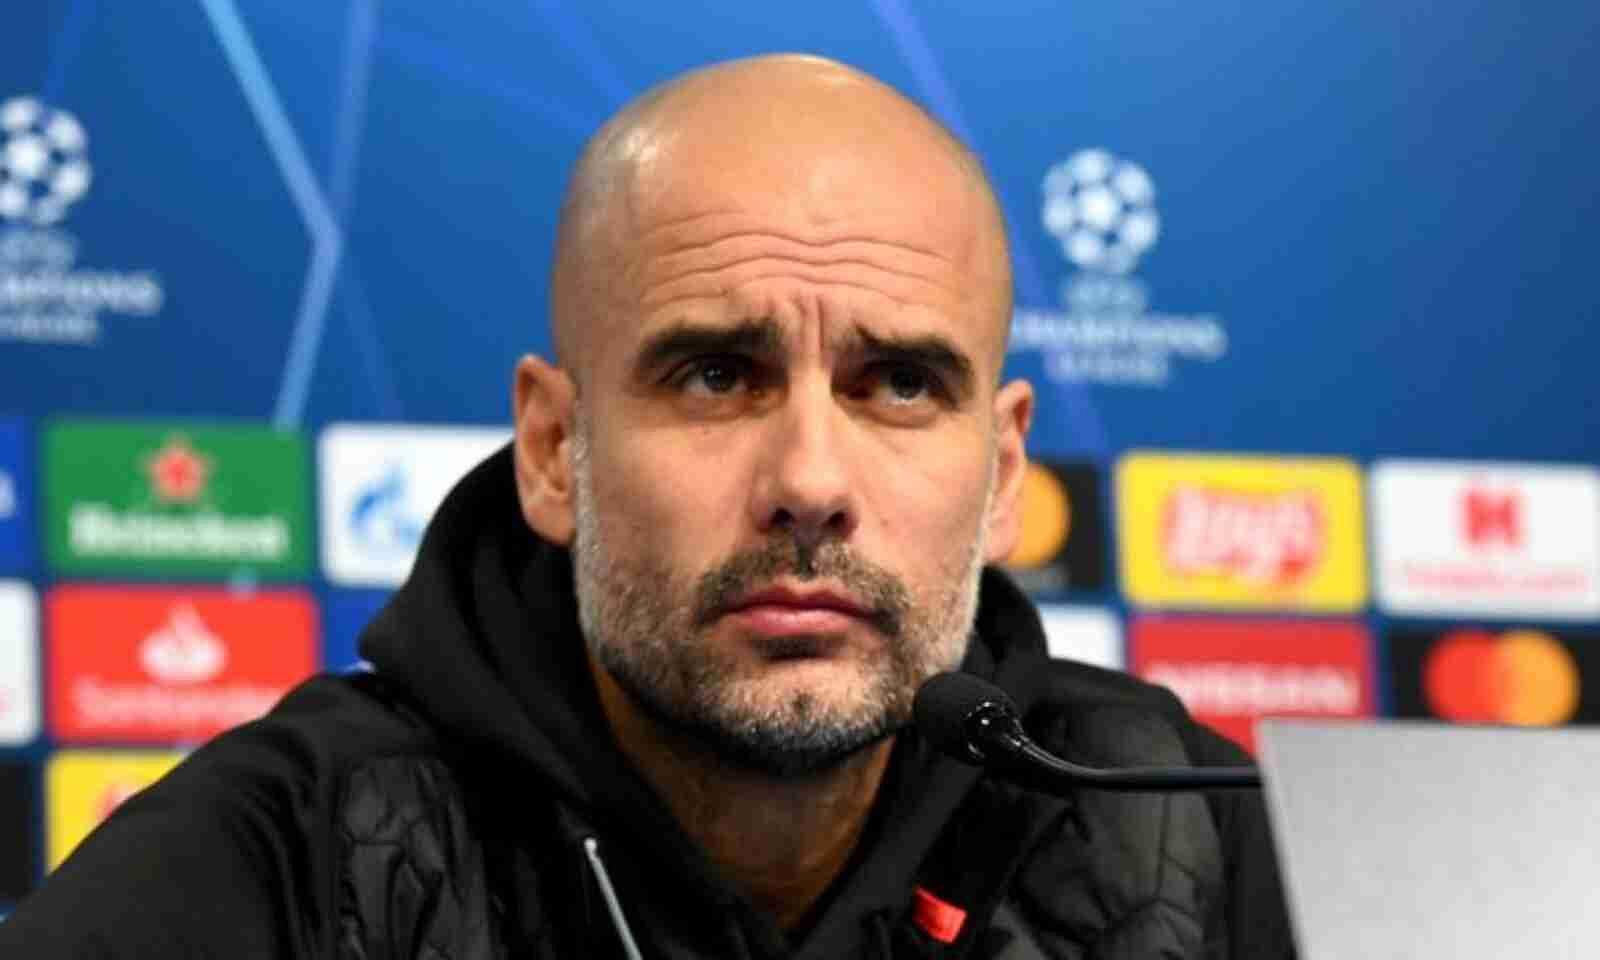 منچسترسیتی / لیگ قهرمانان اروپا / سیتیزن ها / Spain / Manchester City